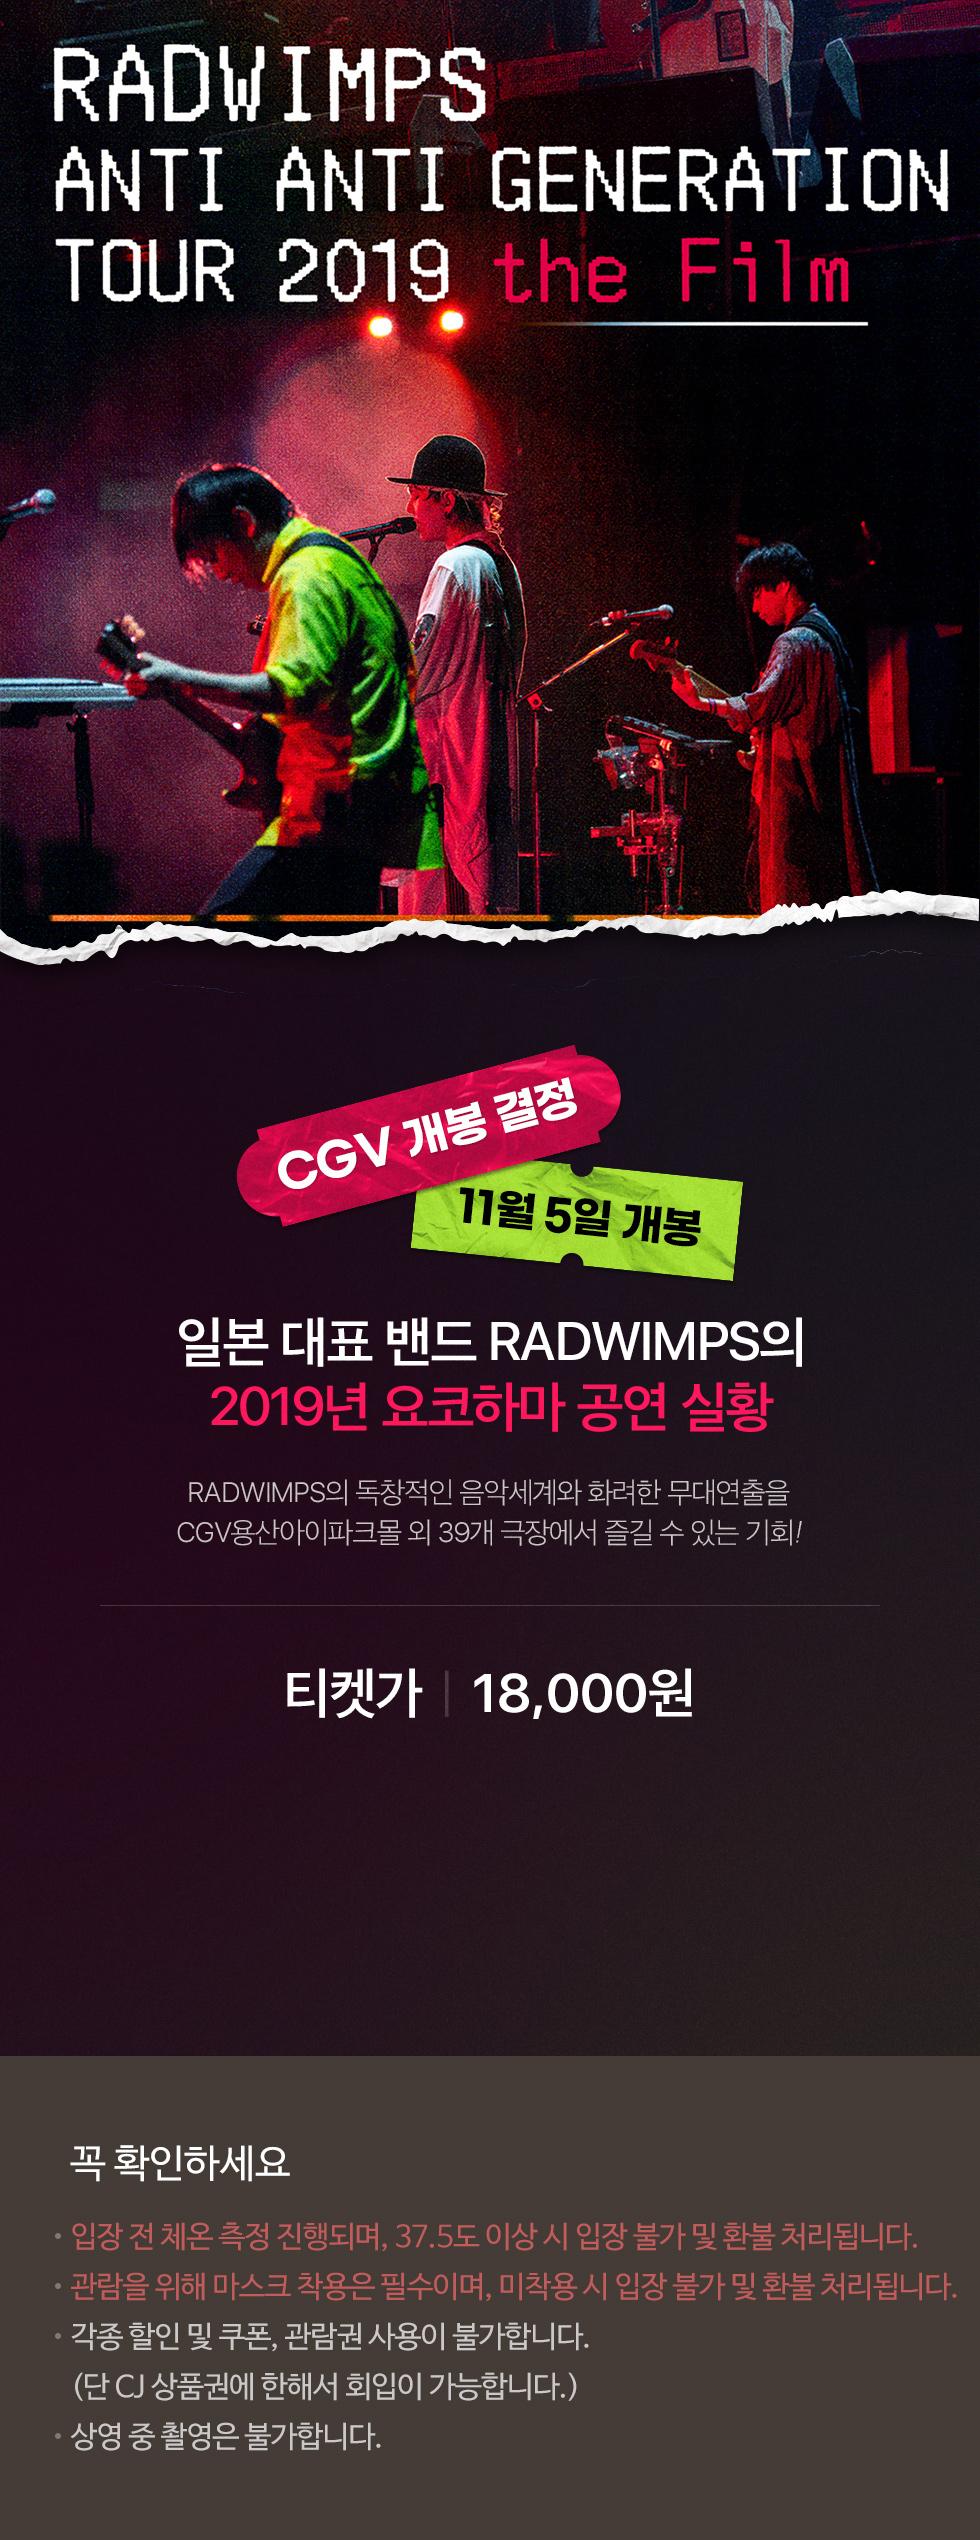 http://img.cgv.co.kr/event/develop/2010_rw/bg_event.jpg